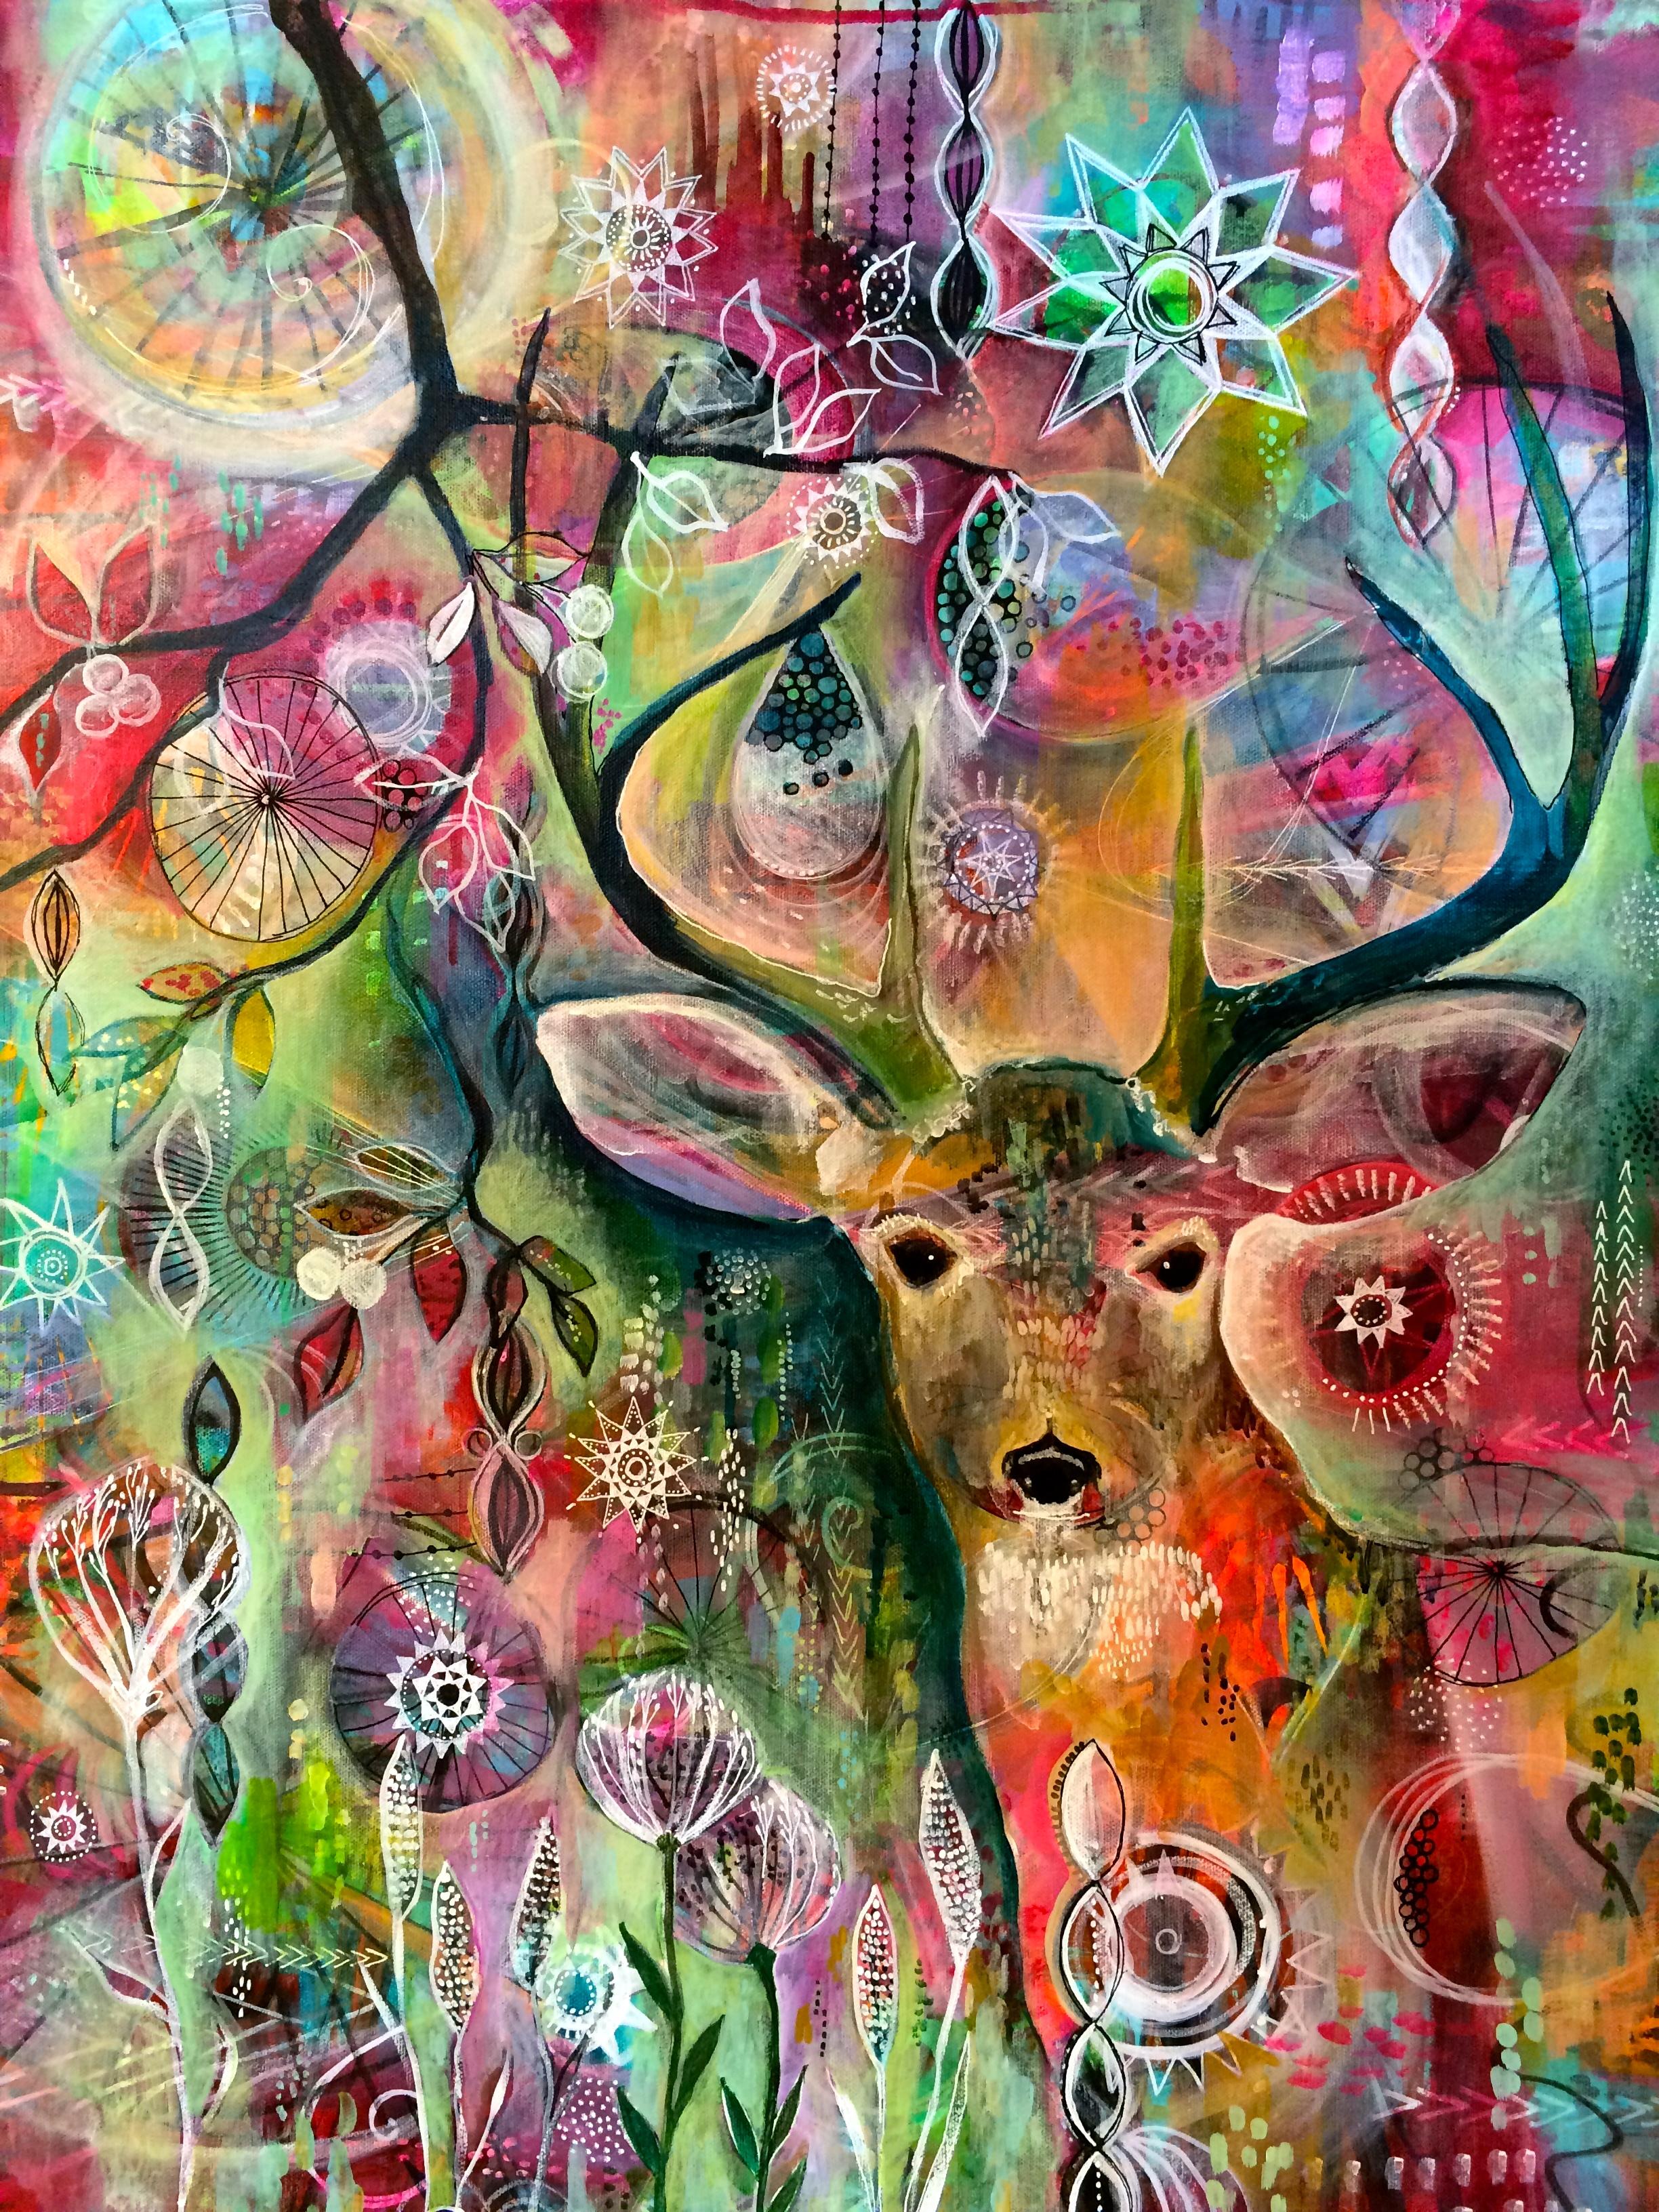 Twilight In Koi Pond >> My Work | Jennifer Currie Art